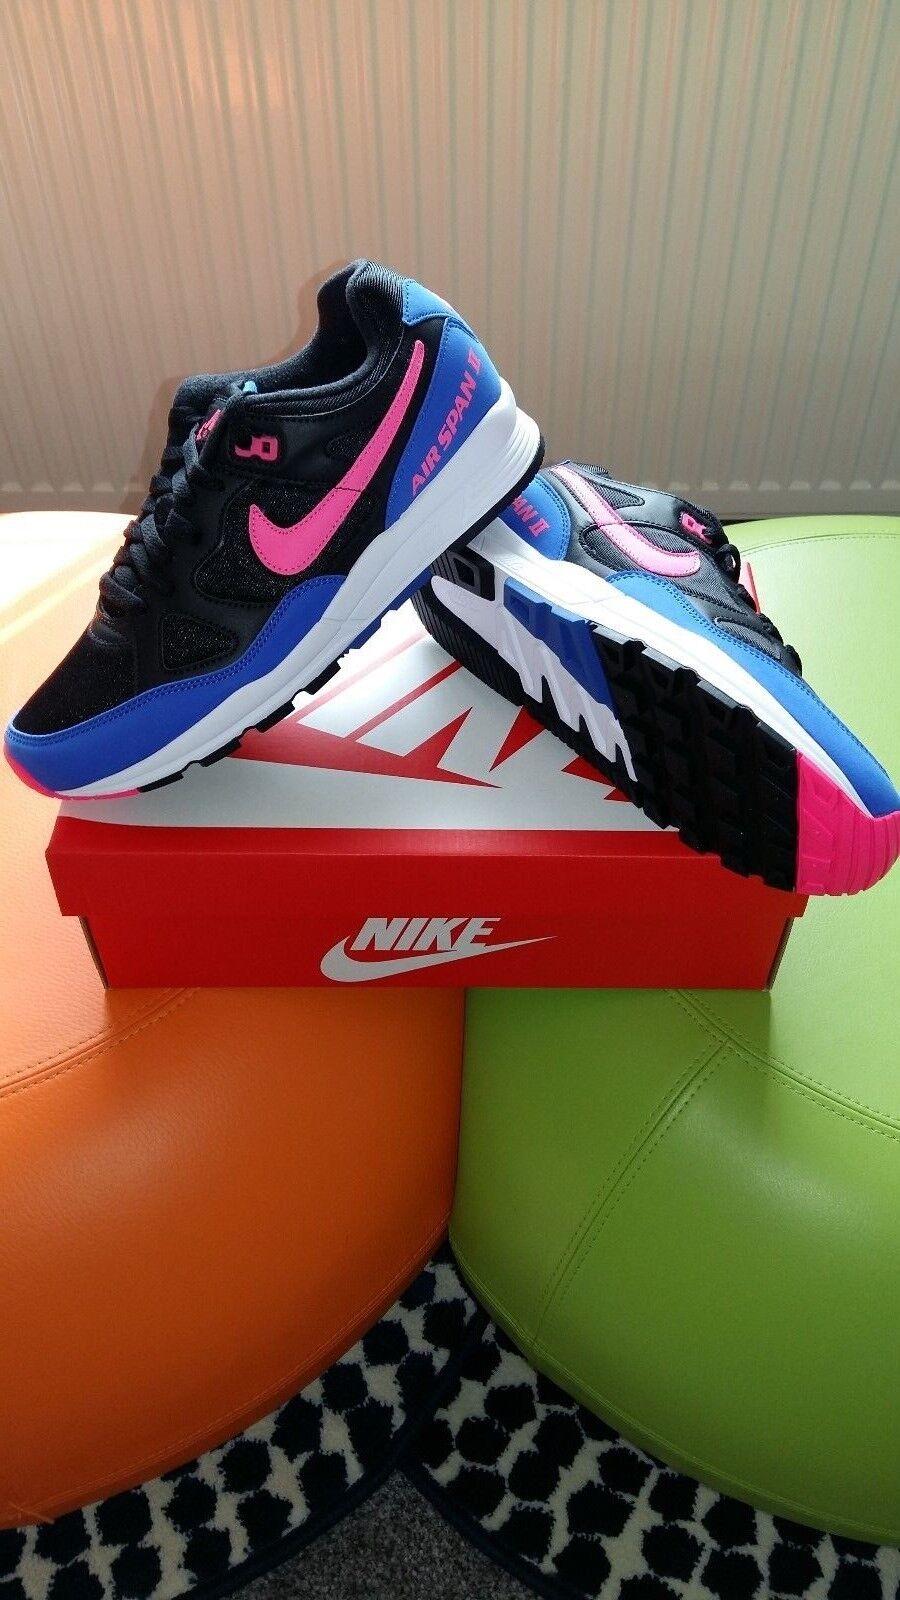 Nike Unisex Span 2... Retro Deportes Air Unisex Nike Zapatillas Reino Unido eur41 7eef1d